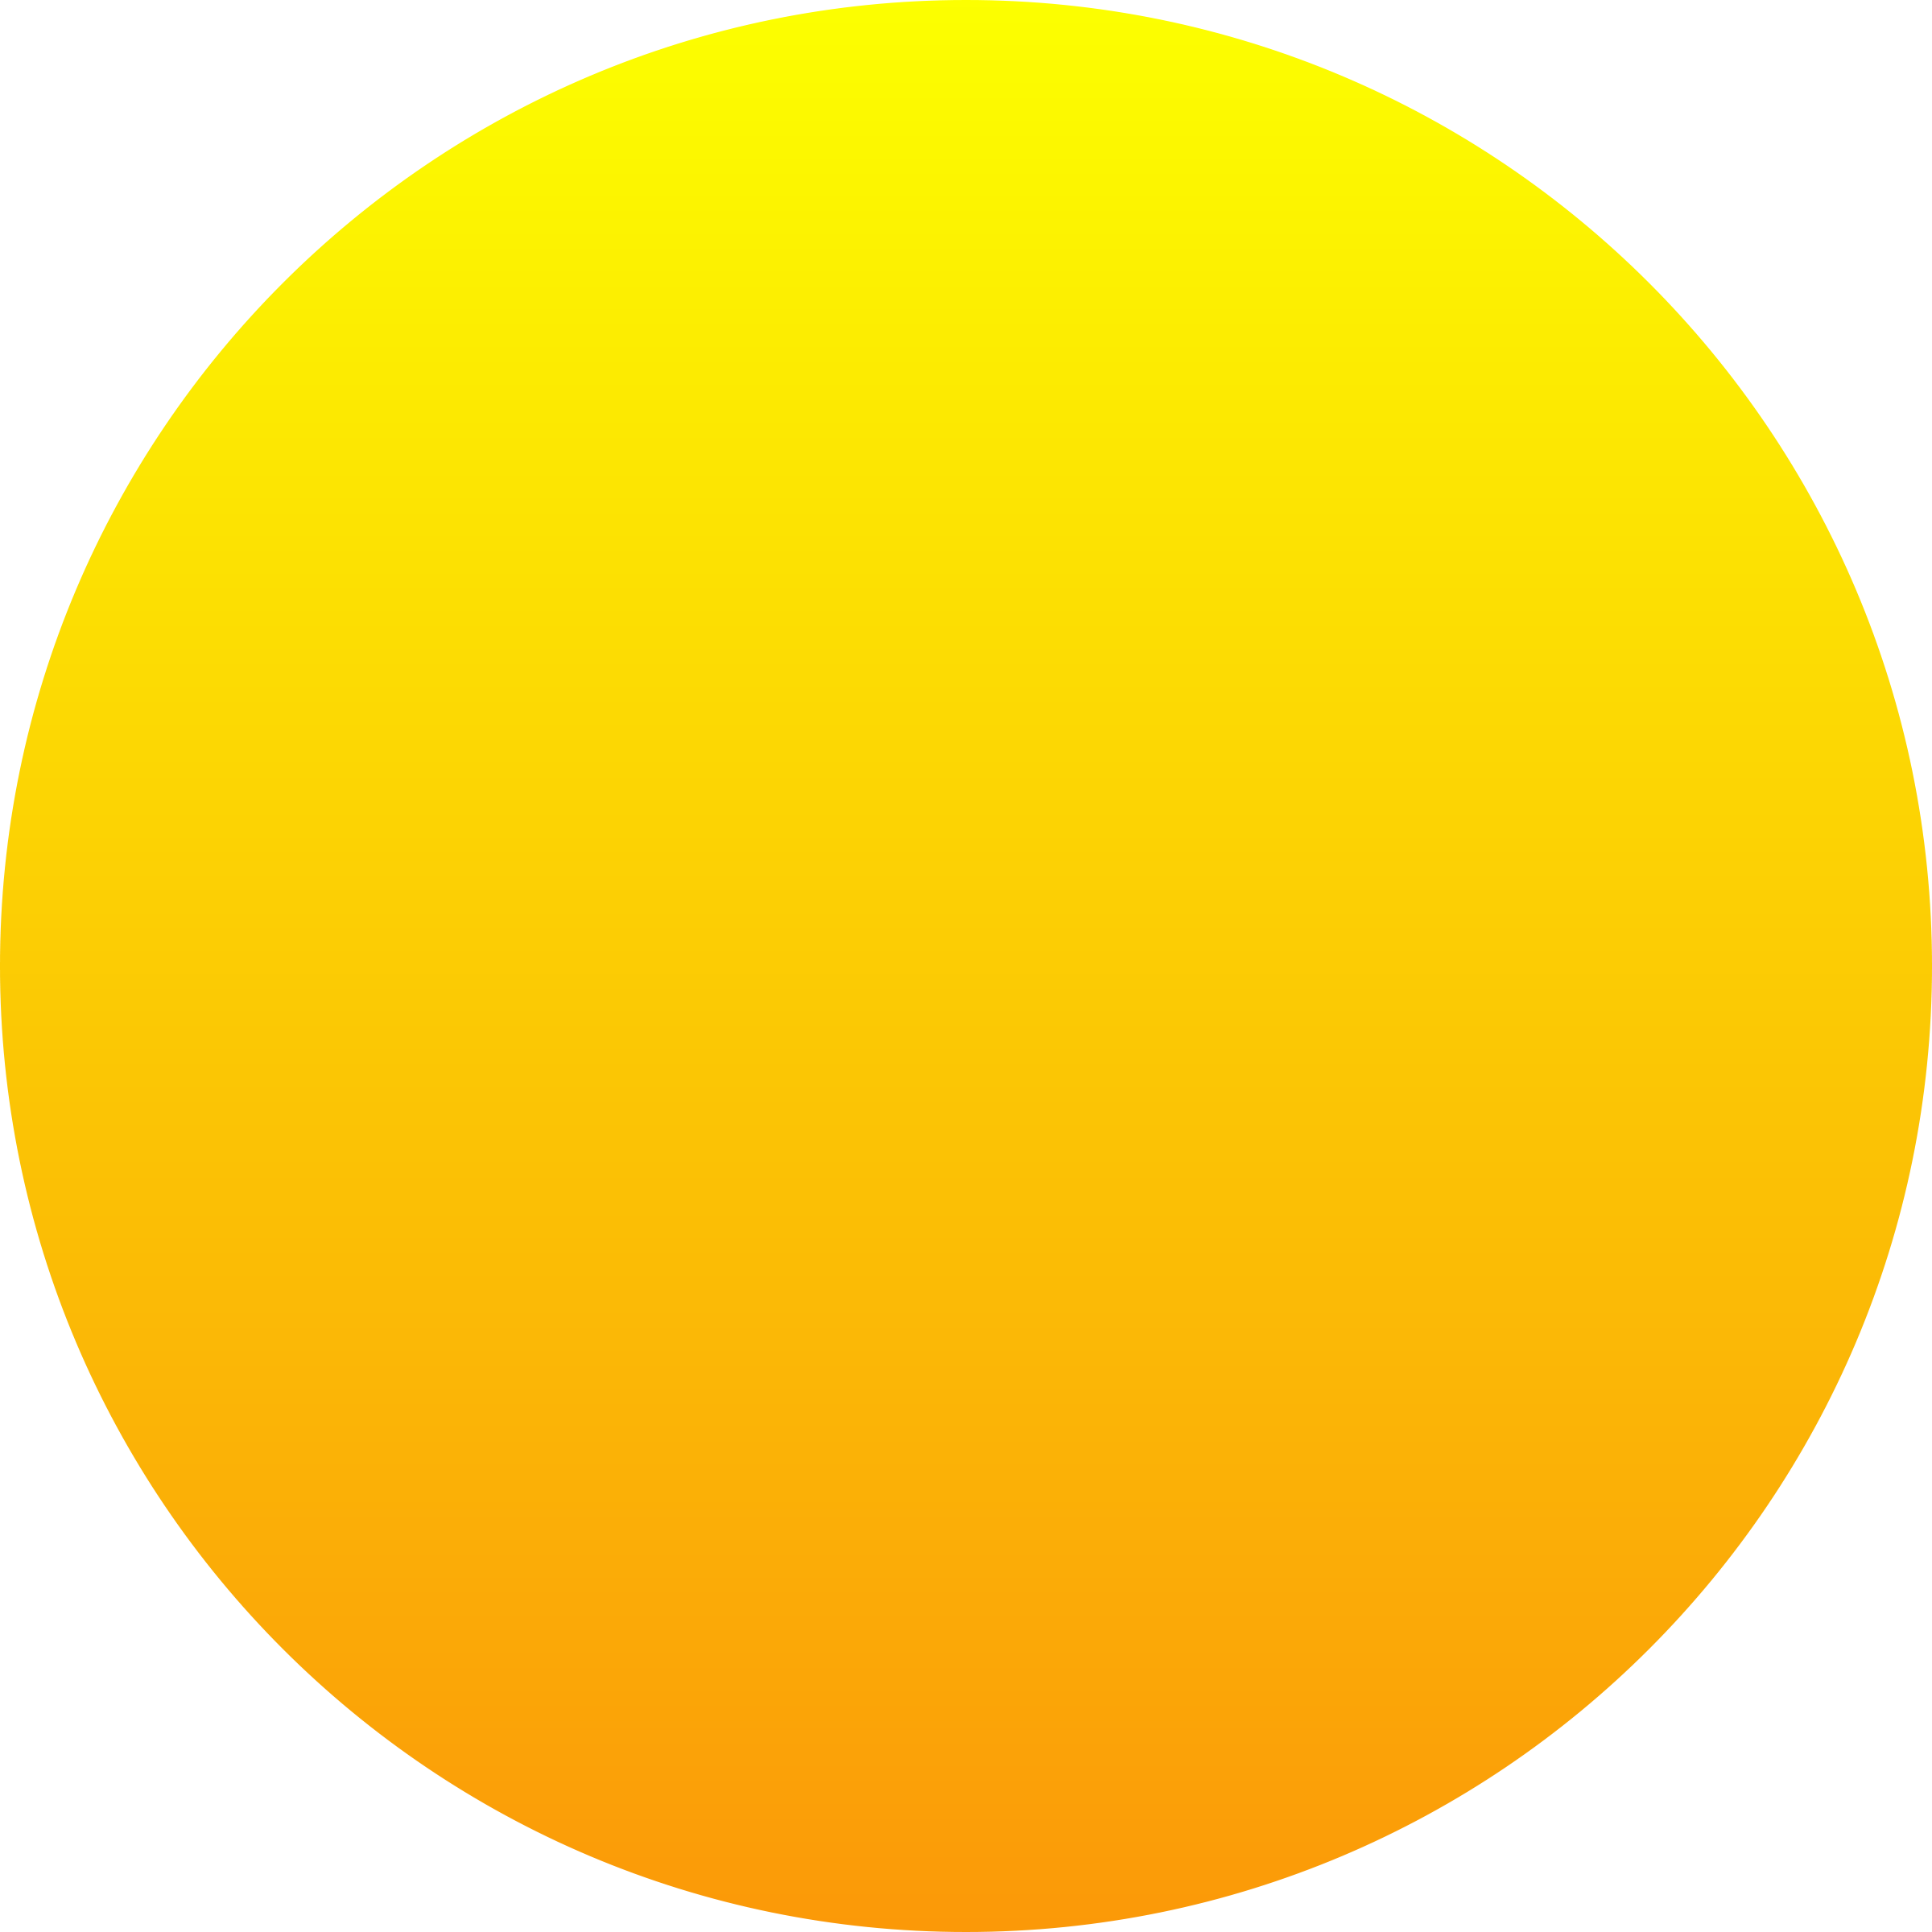 Sun free clip art